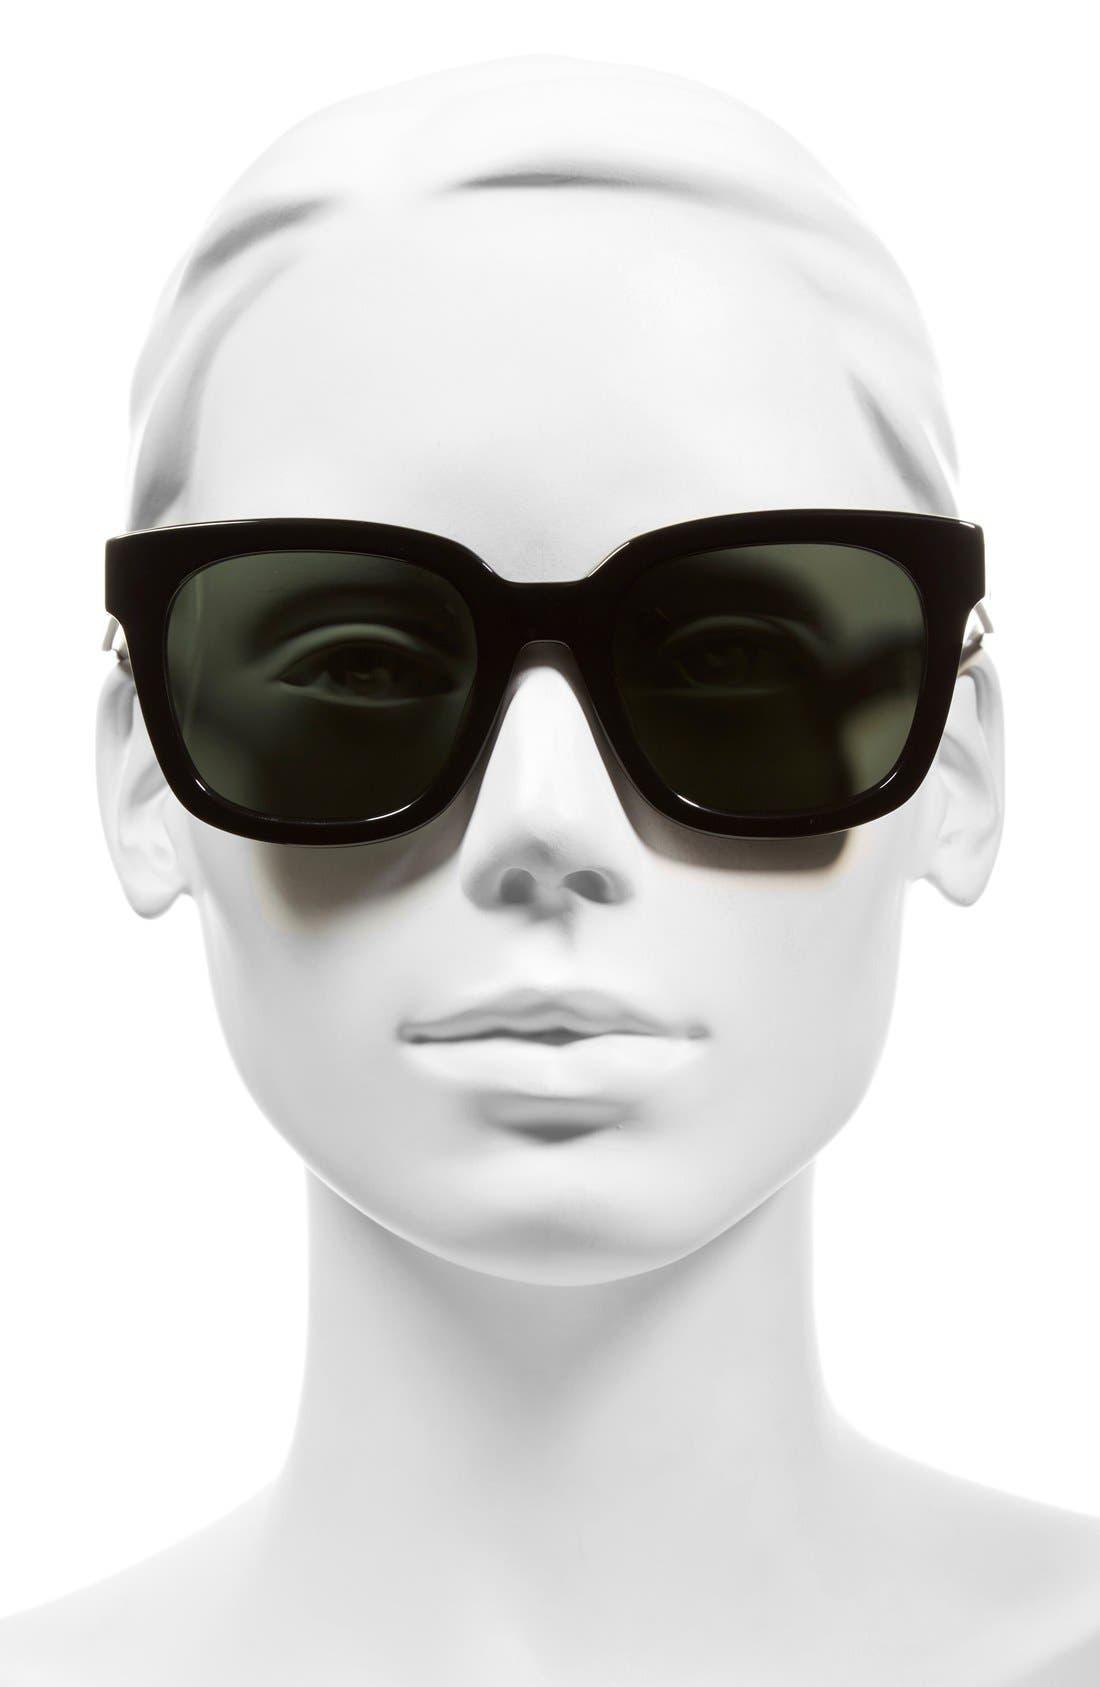 54mm Retro Sunglasses,                             Alternate thumbnail 2, color,                             001